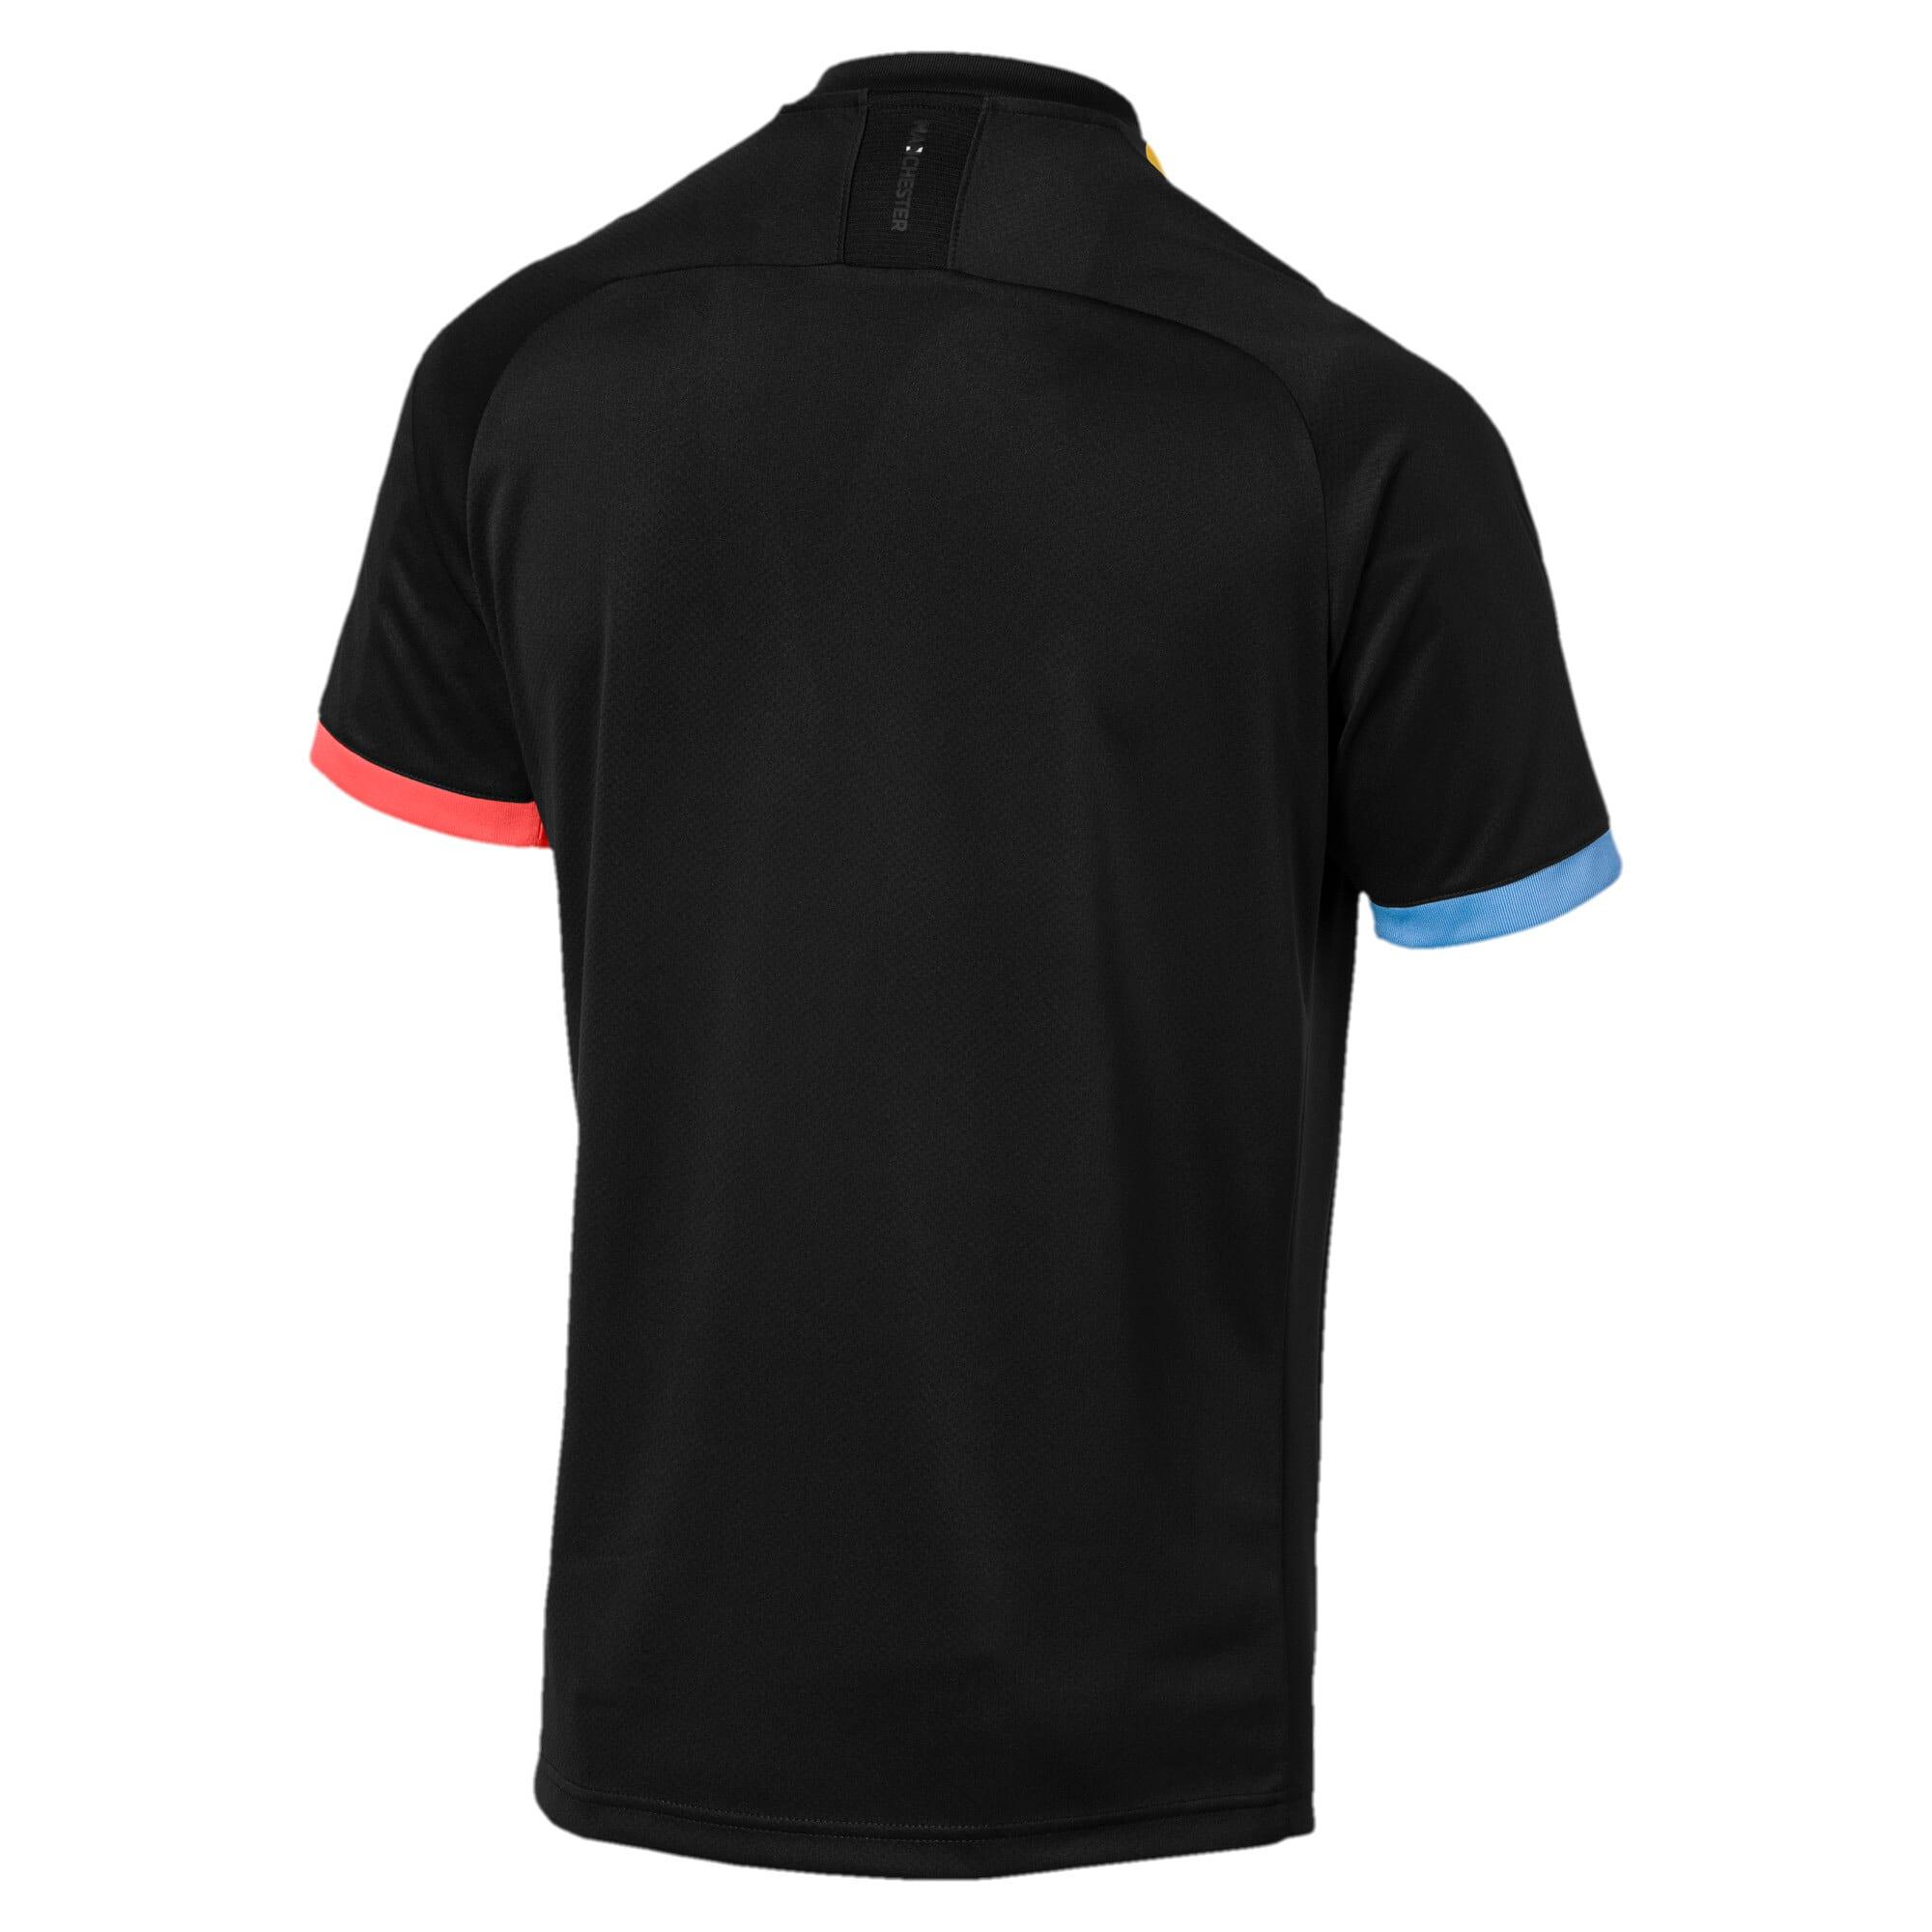 Thumbnail 2 of Manchester City Men's Away Replica Jersey, Puma Black-Georgia Peach, medium